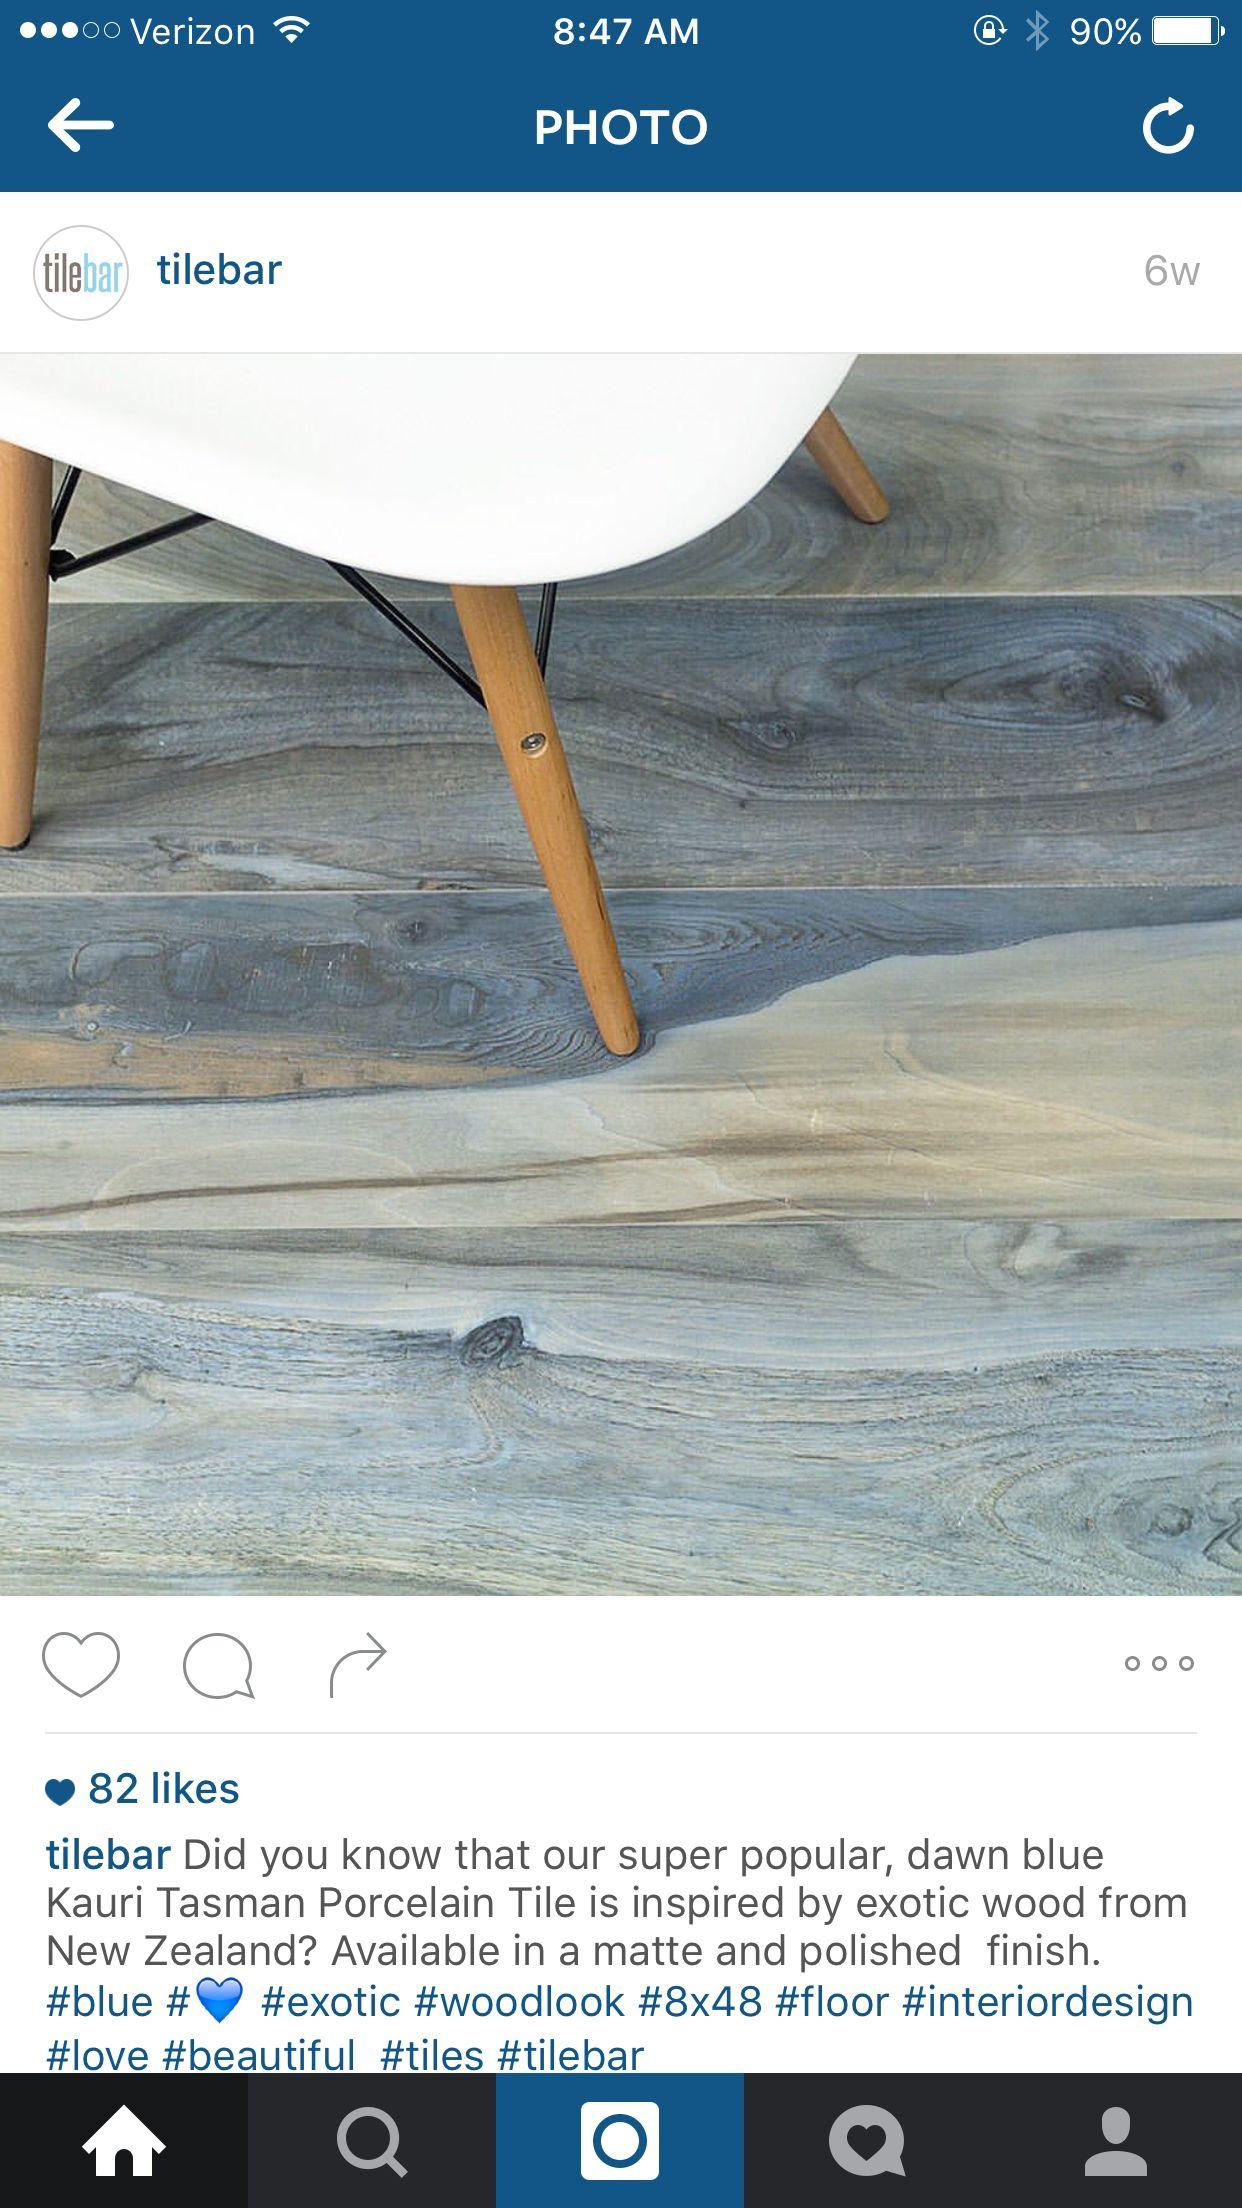 Coolest tile ever | house re design | Pinterest | House ...